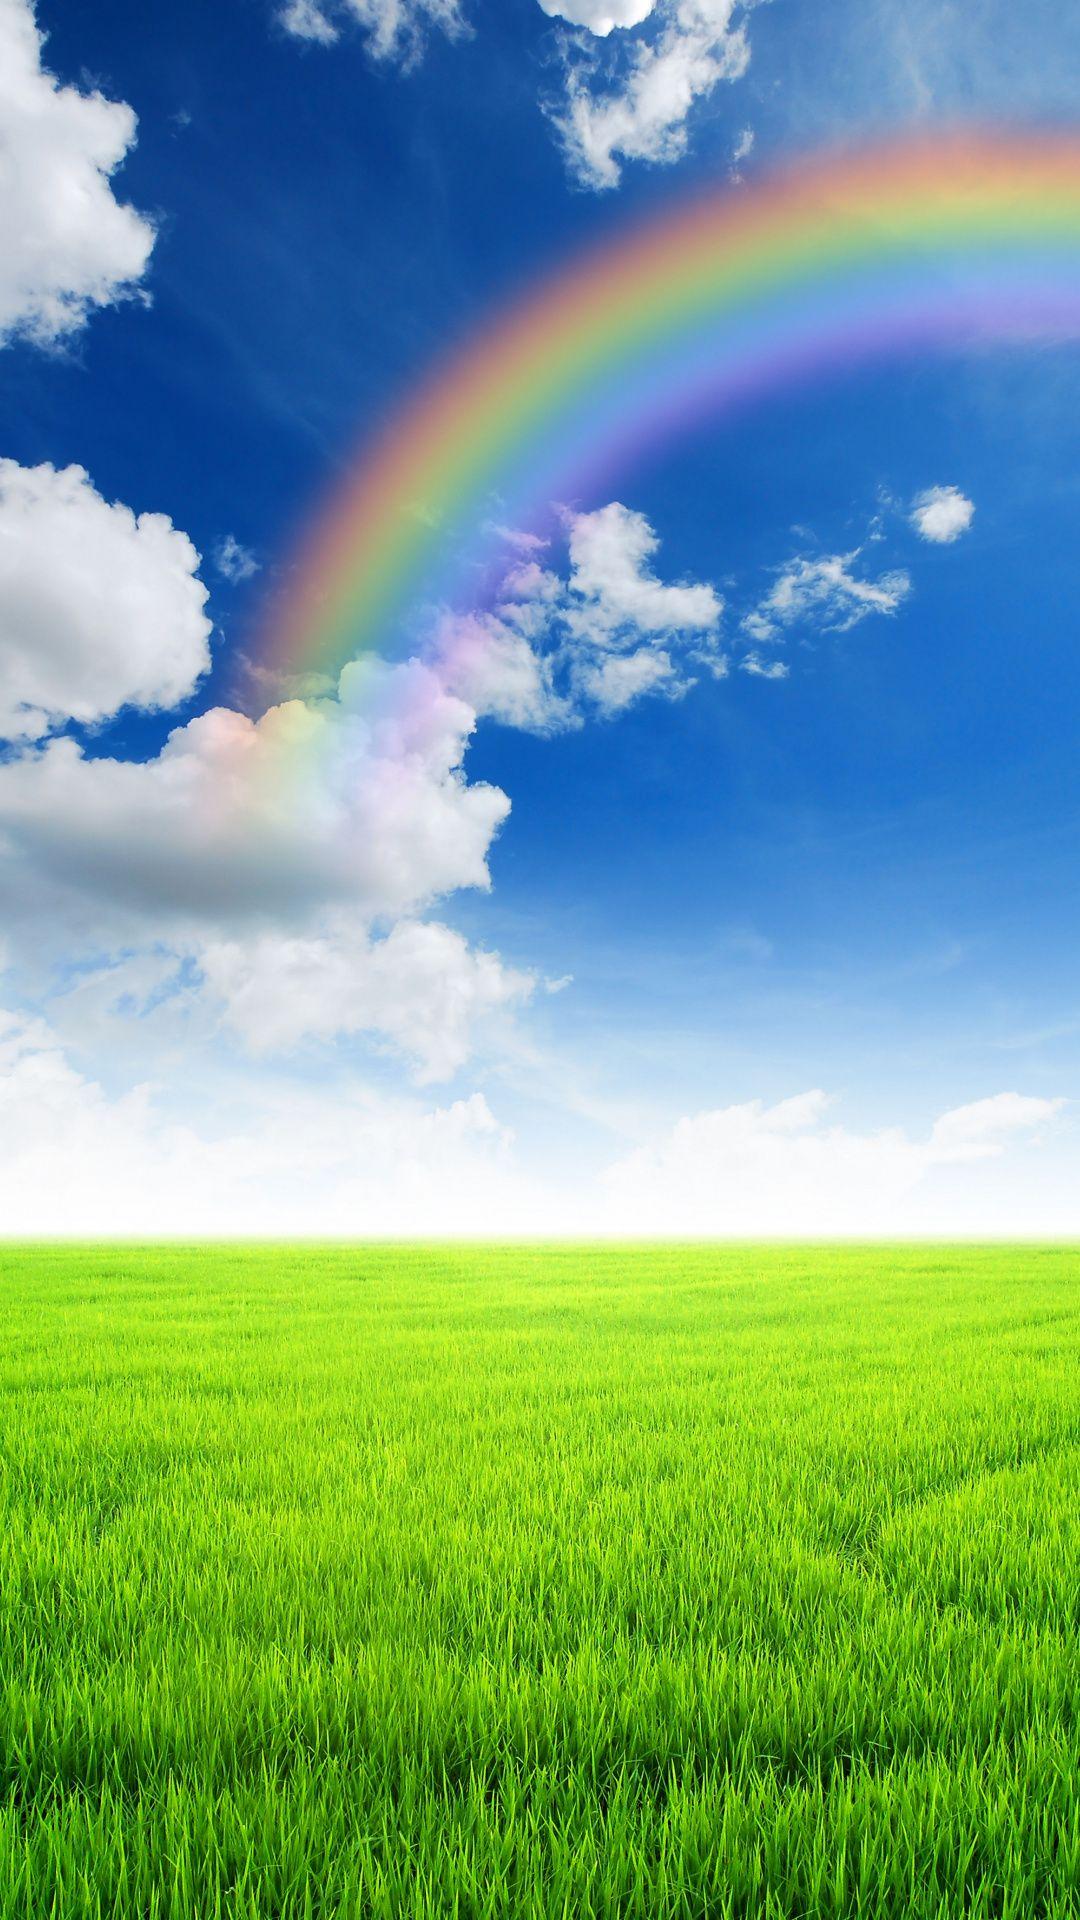 Wallpapers Sky Wall Rainbow Grasses Grazing Sky Rainbow Sky Nature Backgrounds Wallpaper grass field rainbow hill fog